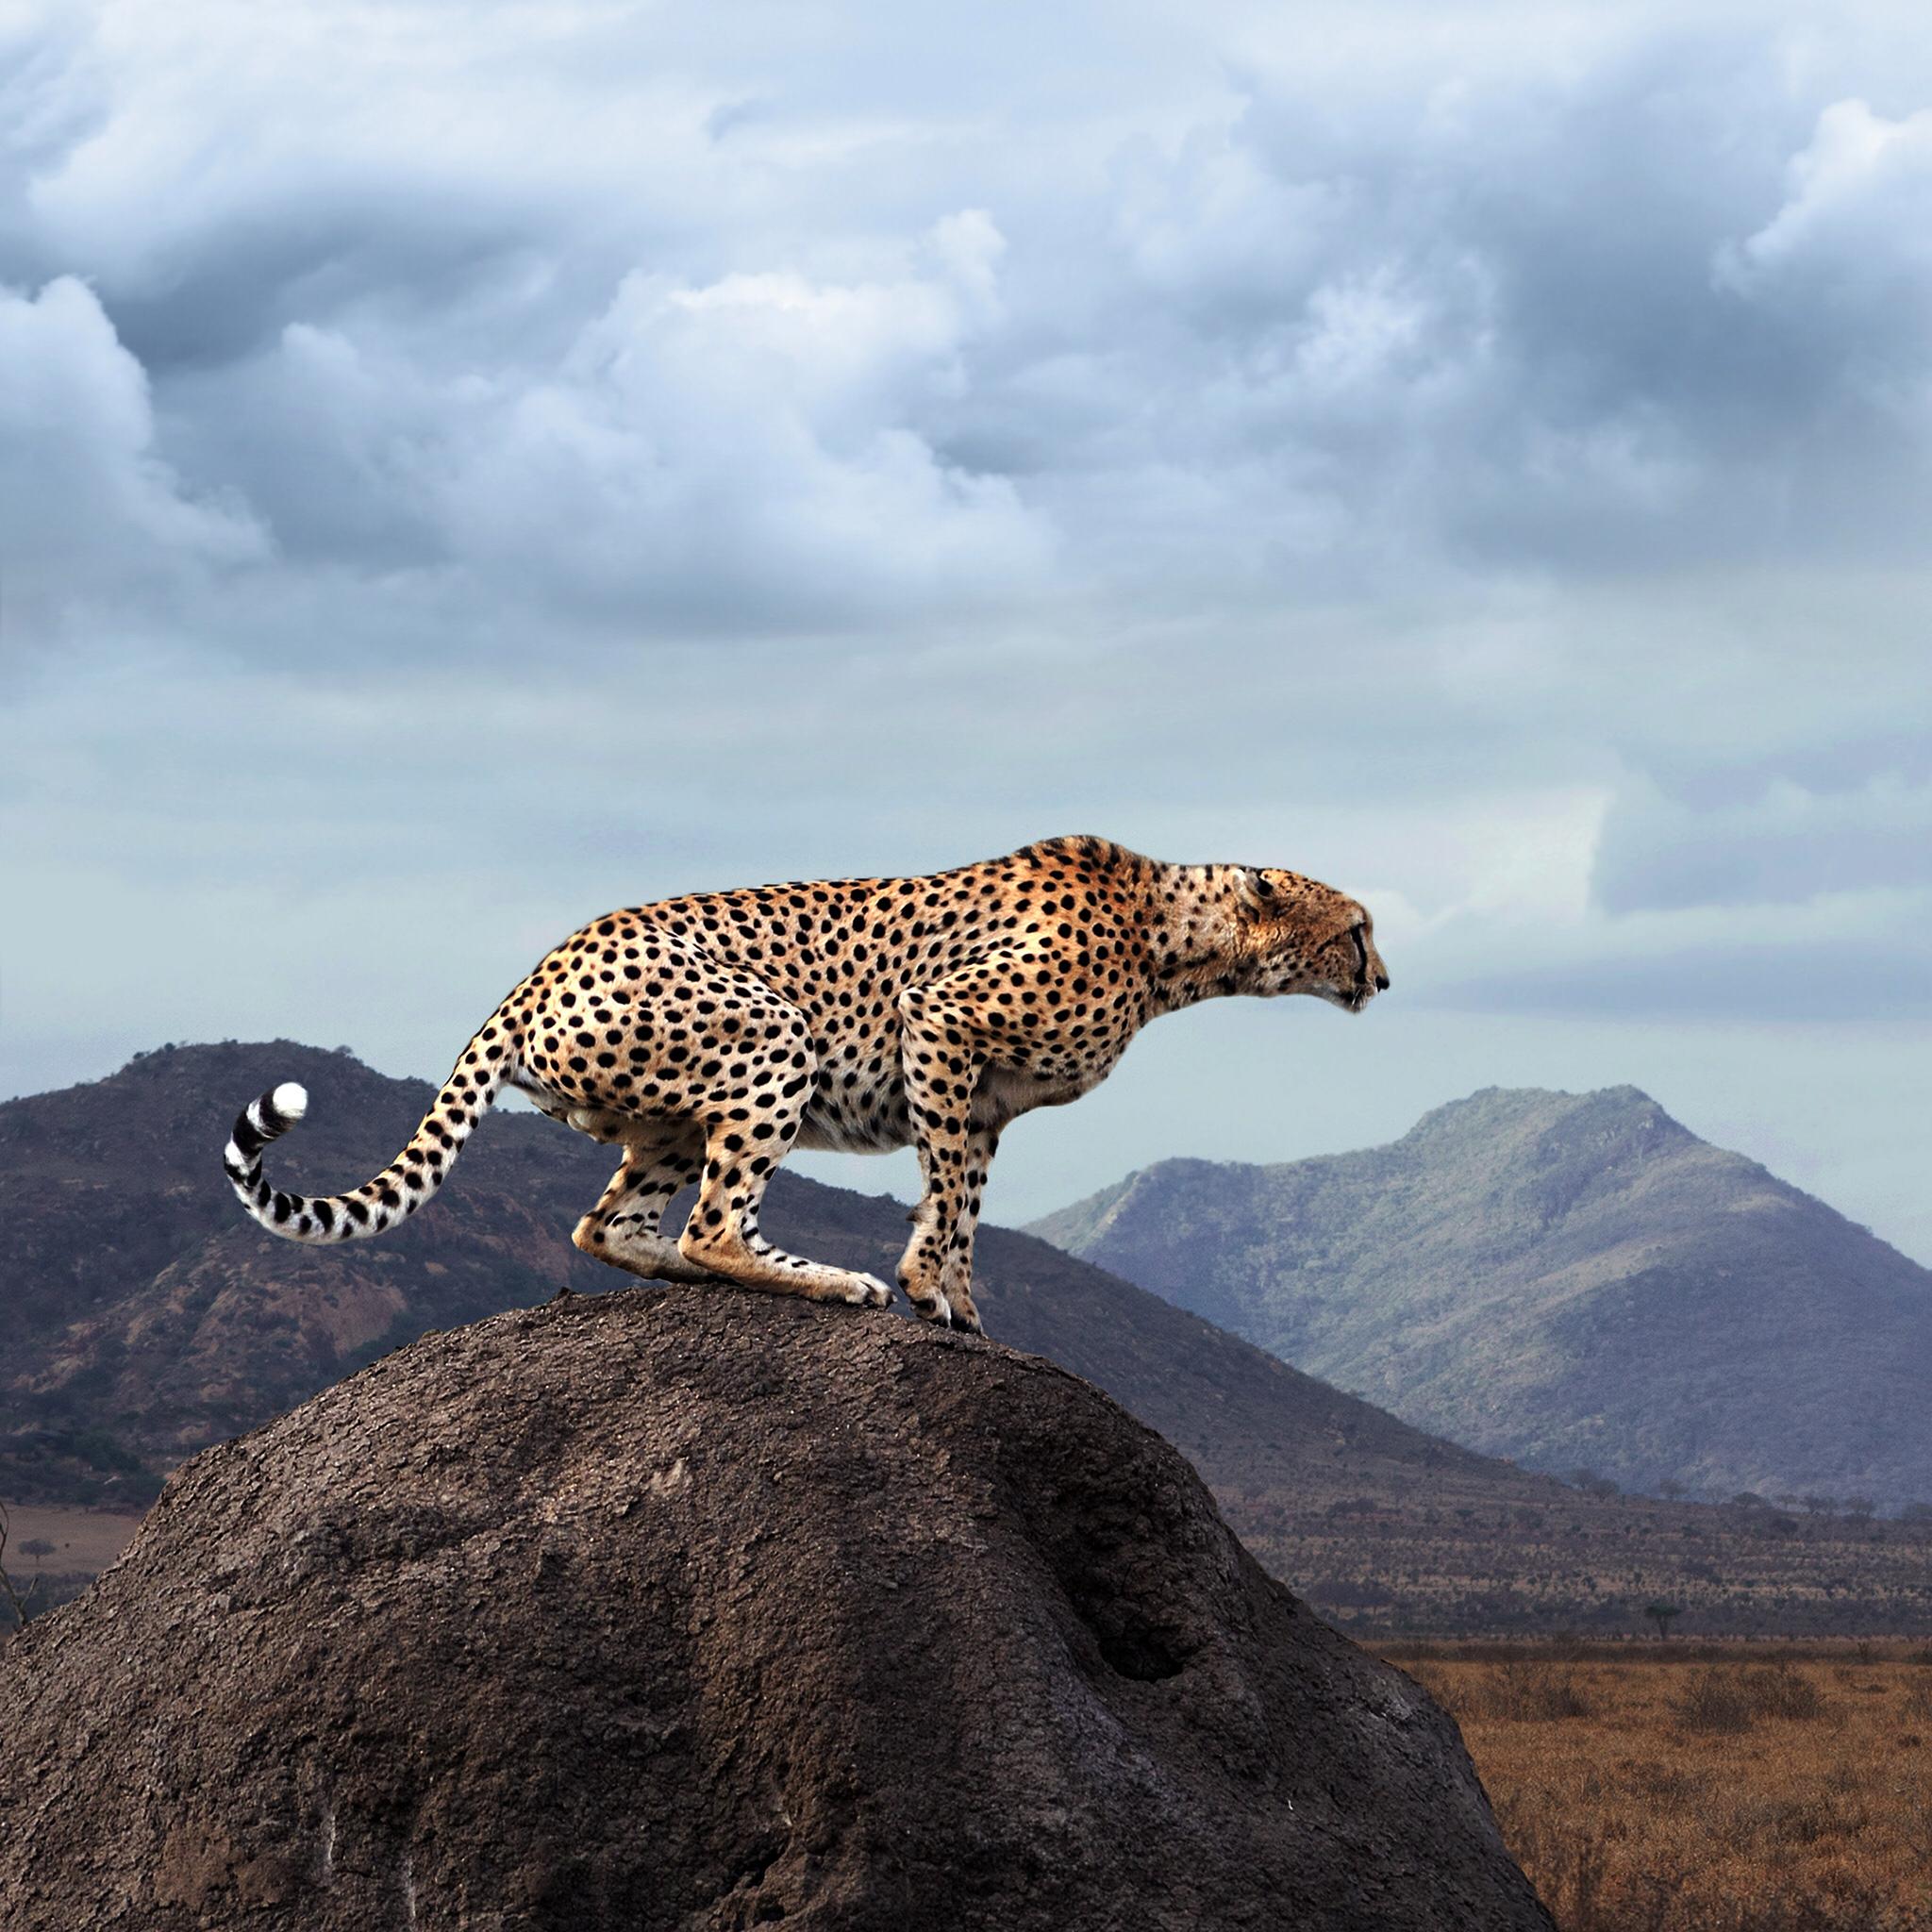 Pin by SidneyBarjon on Animaux African wildlife, Animals